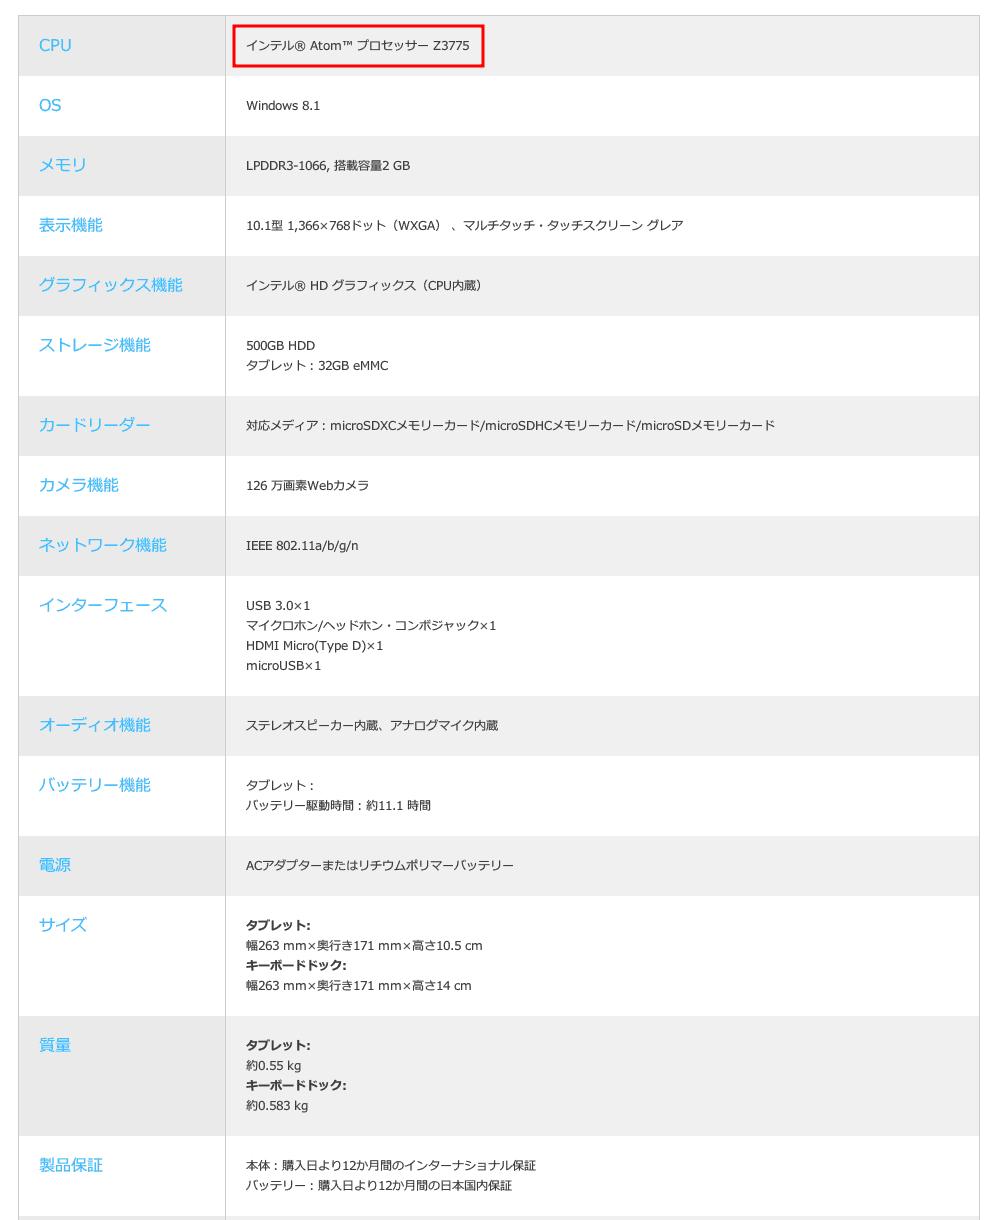 T100TA スペック表